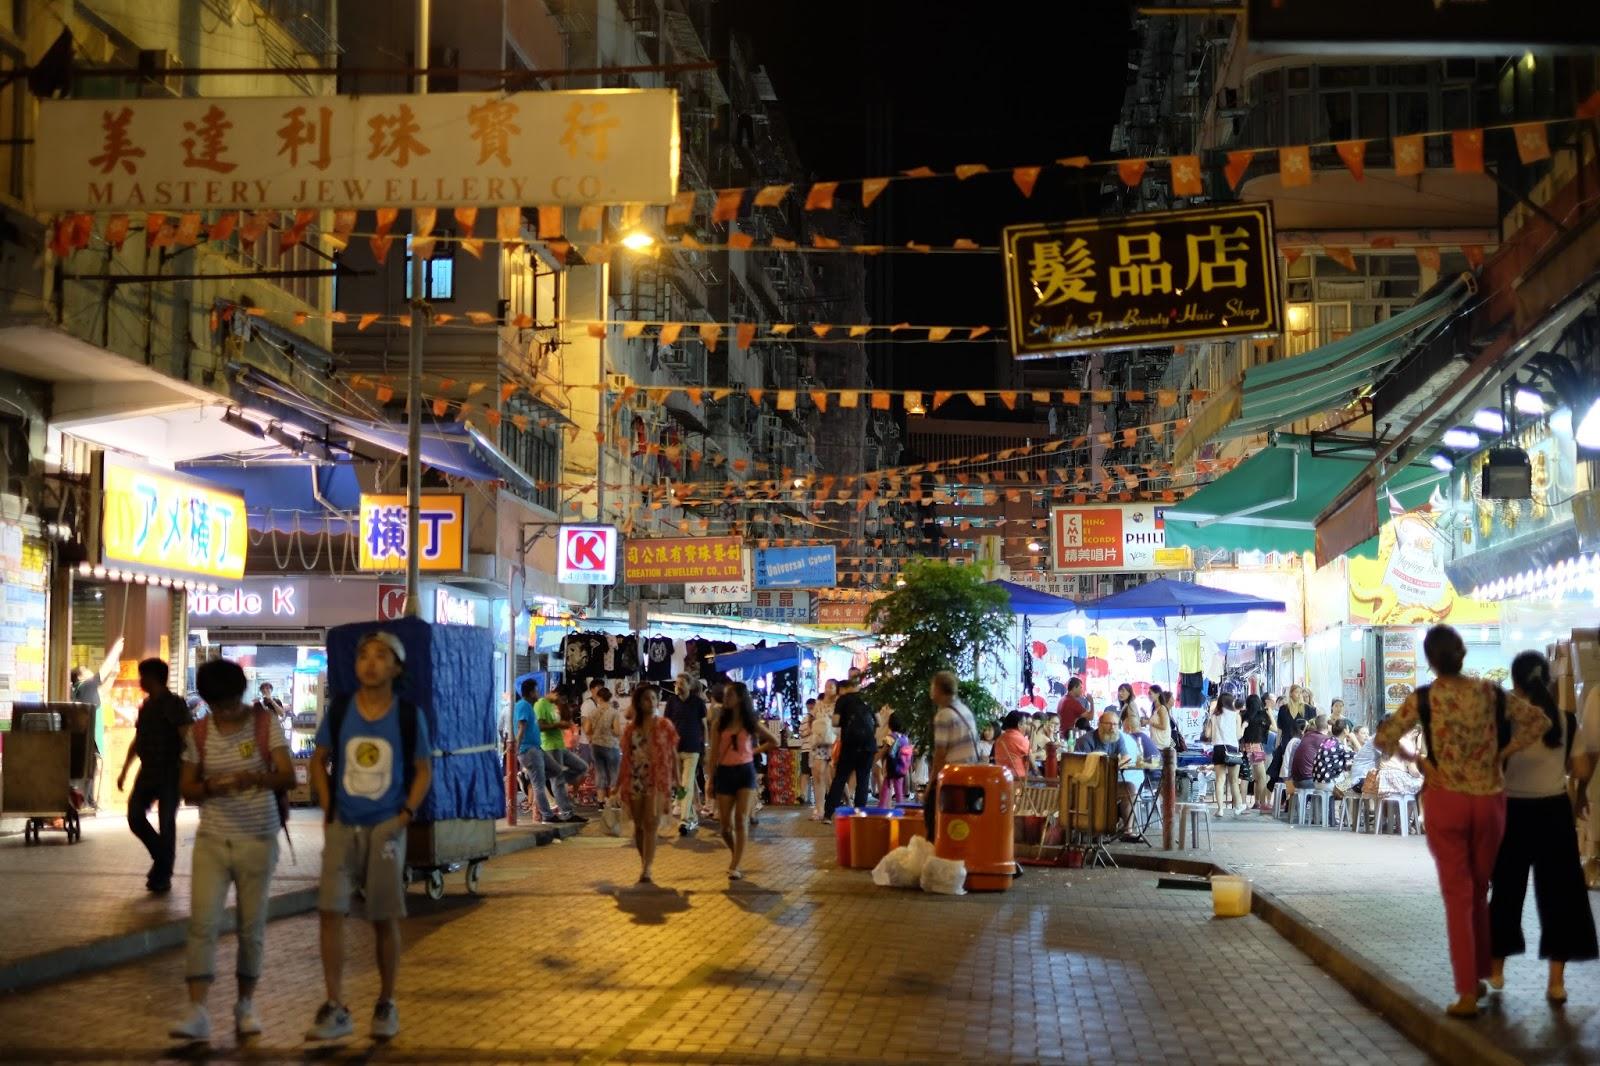 Biaya Liburan  Hari Di Hong Kong Dan Singapura  Temple Street Yau Ma Tei